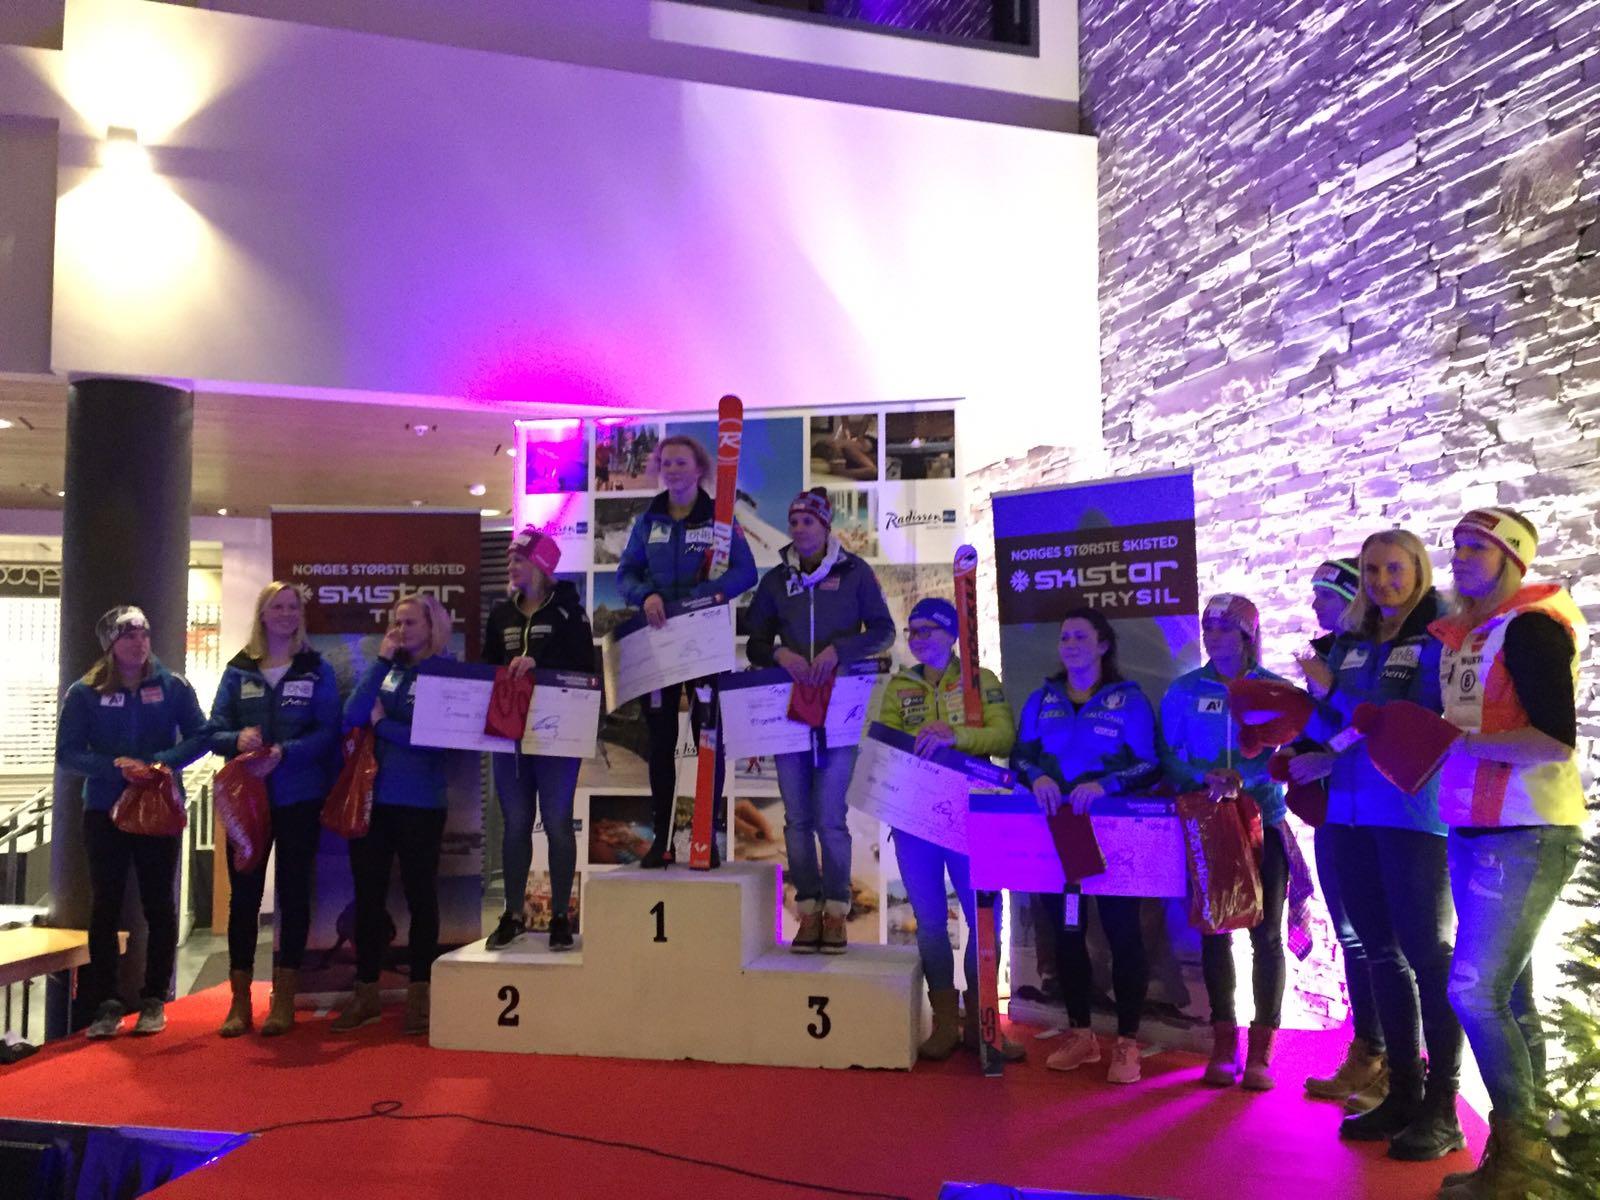 Premiazione gigante donne a Trysil. Nicole Agnelli è la quinta da destra (@Salvadori)